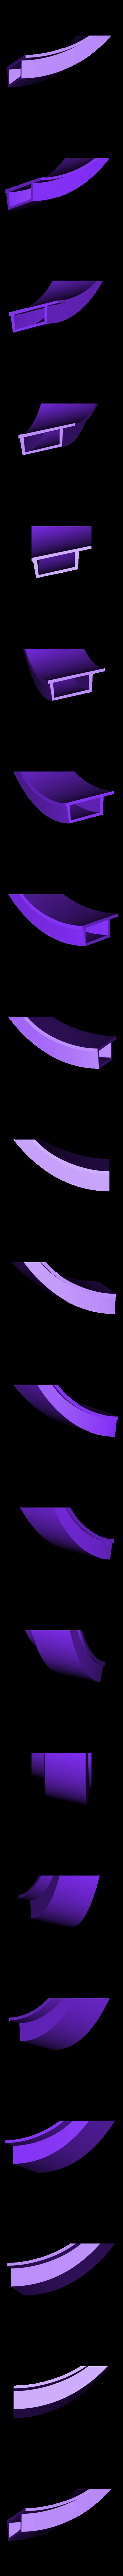 Part 21 v1.stl Download STL file ARF Trooper Helmet • 3D print object, VillainousPropShop